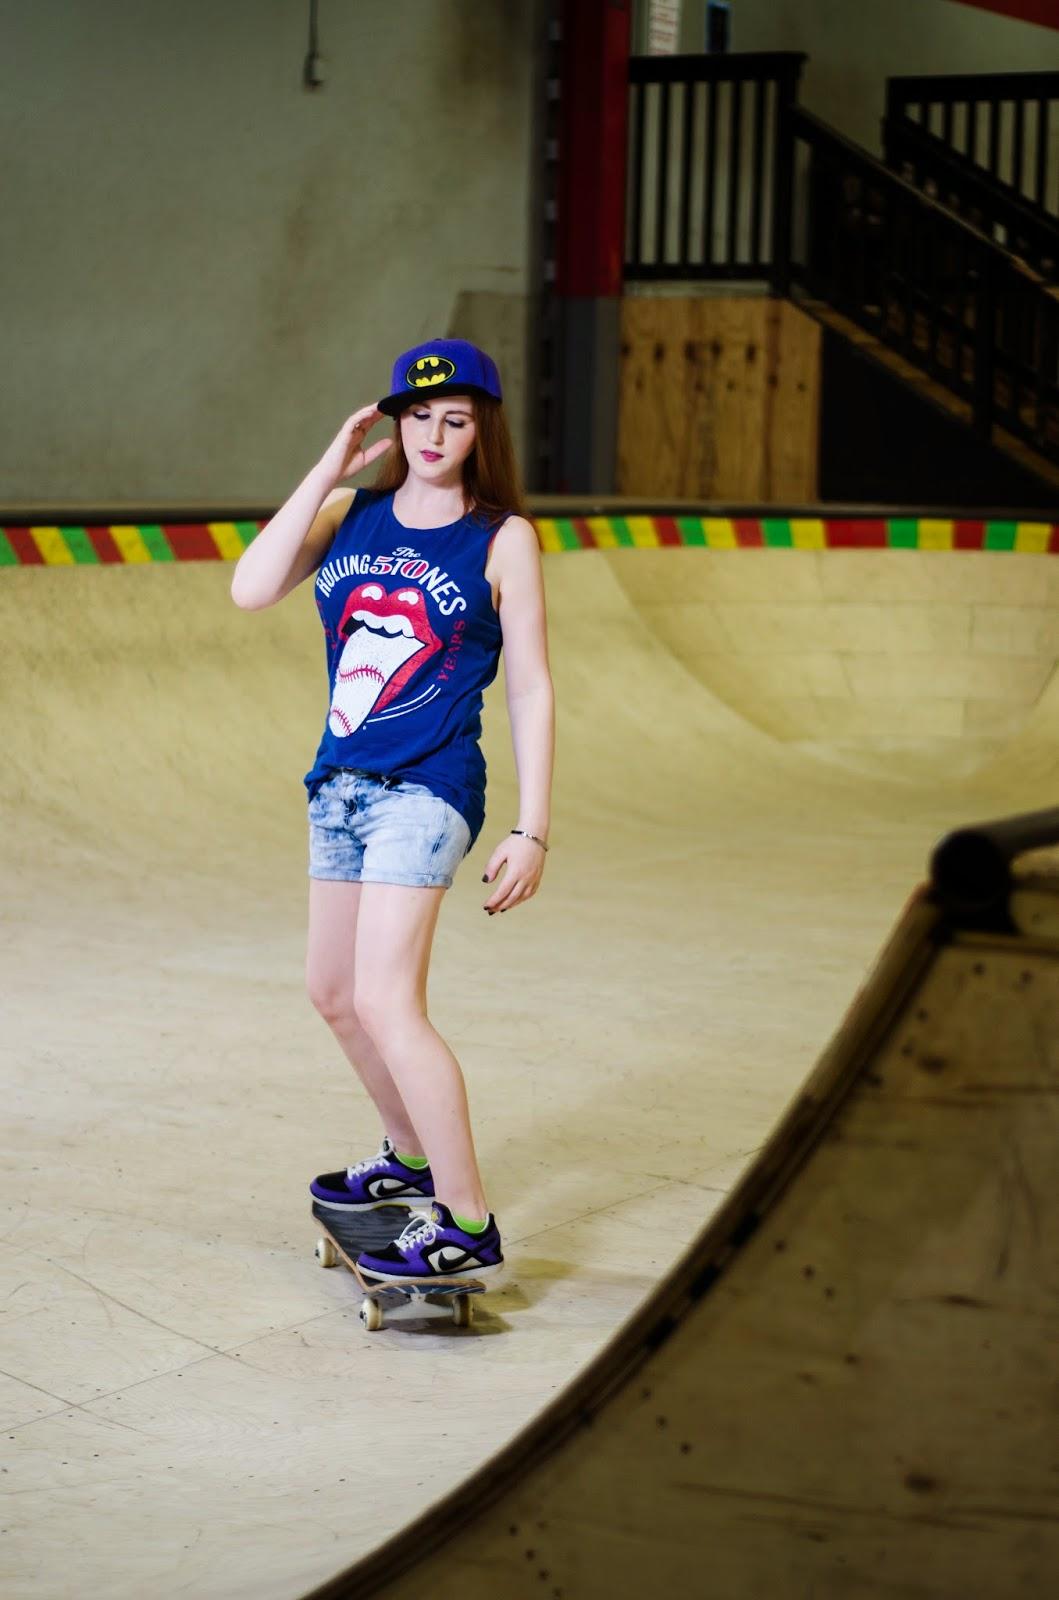 twin vogue grunge fashion series quotskater girlquot